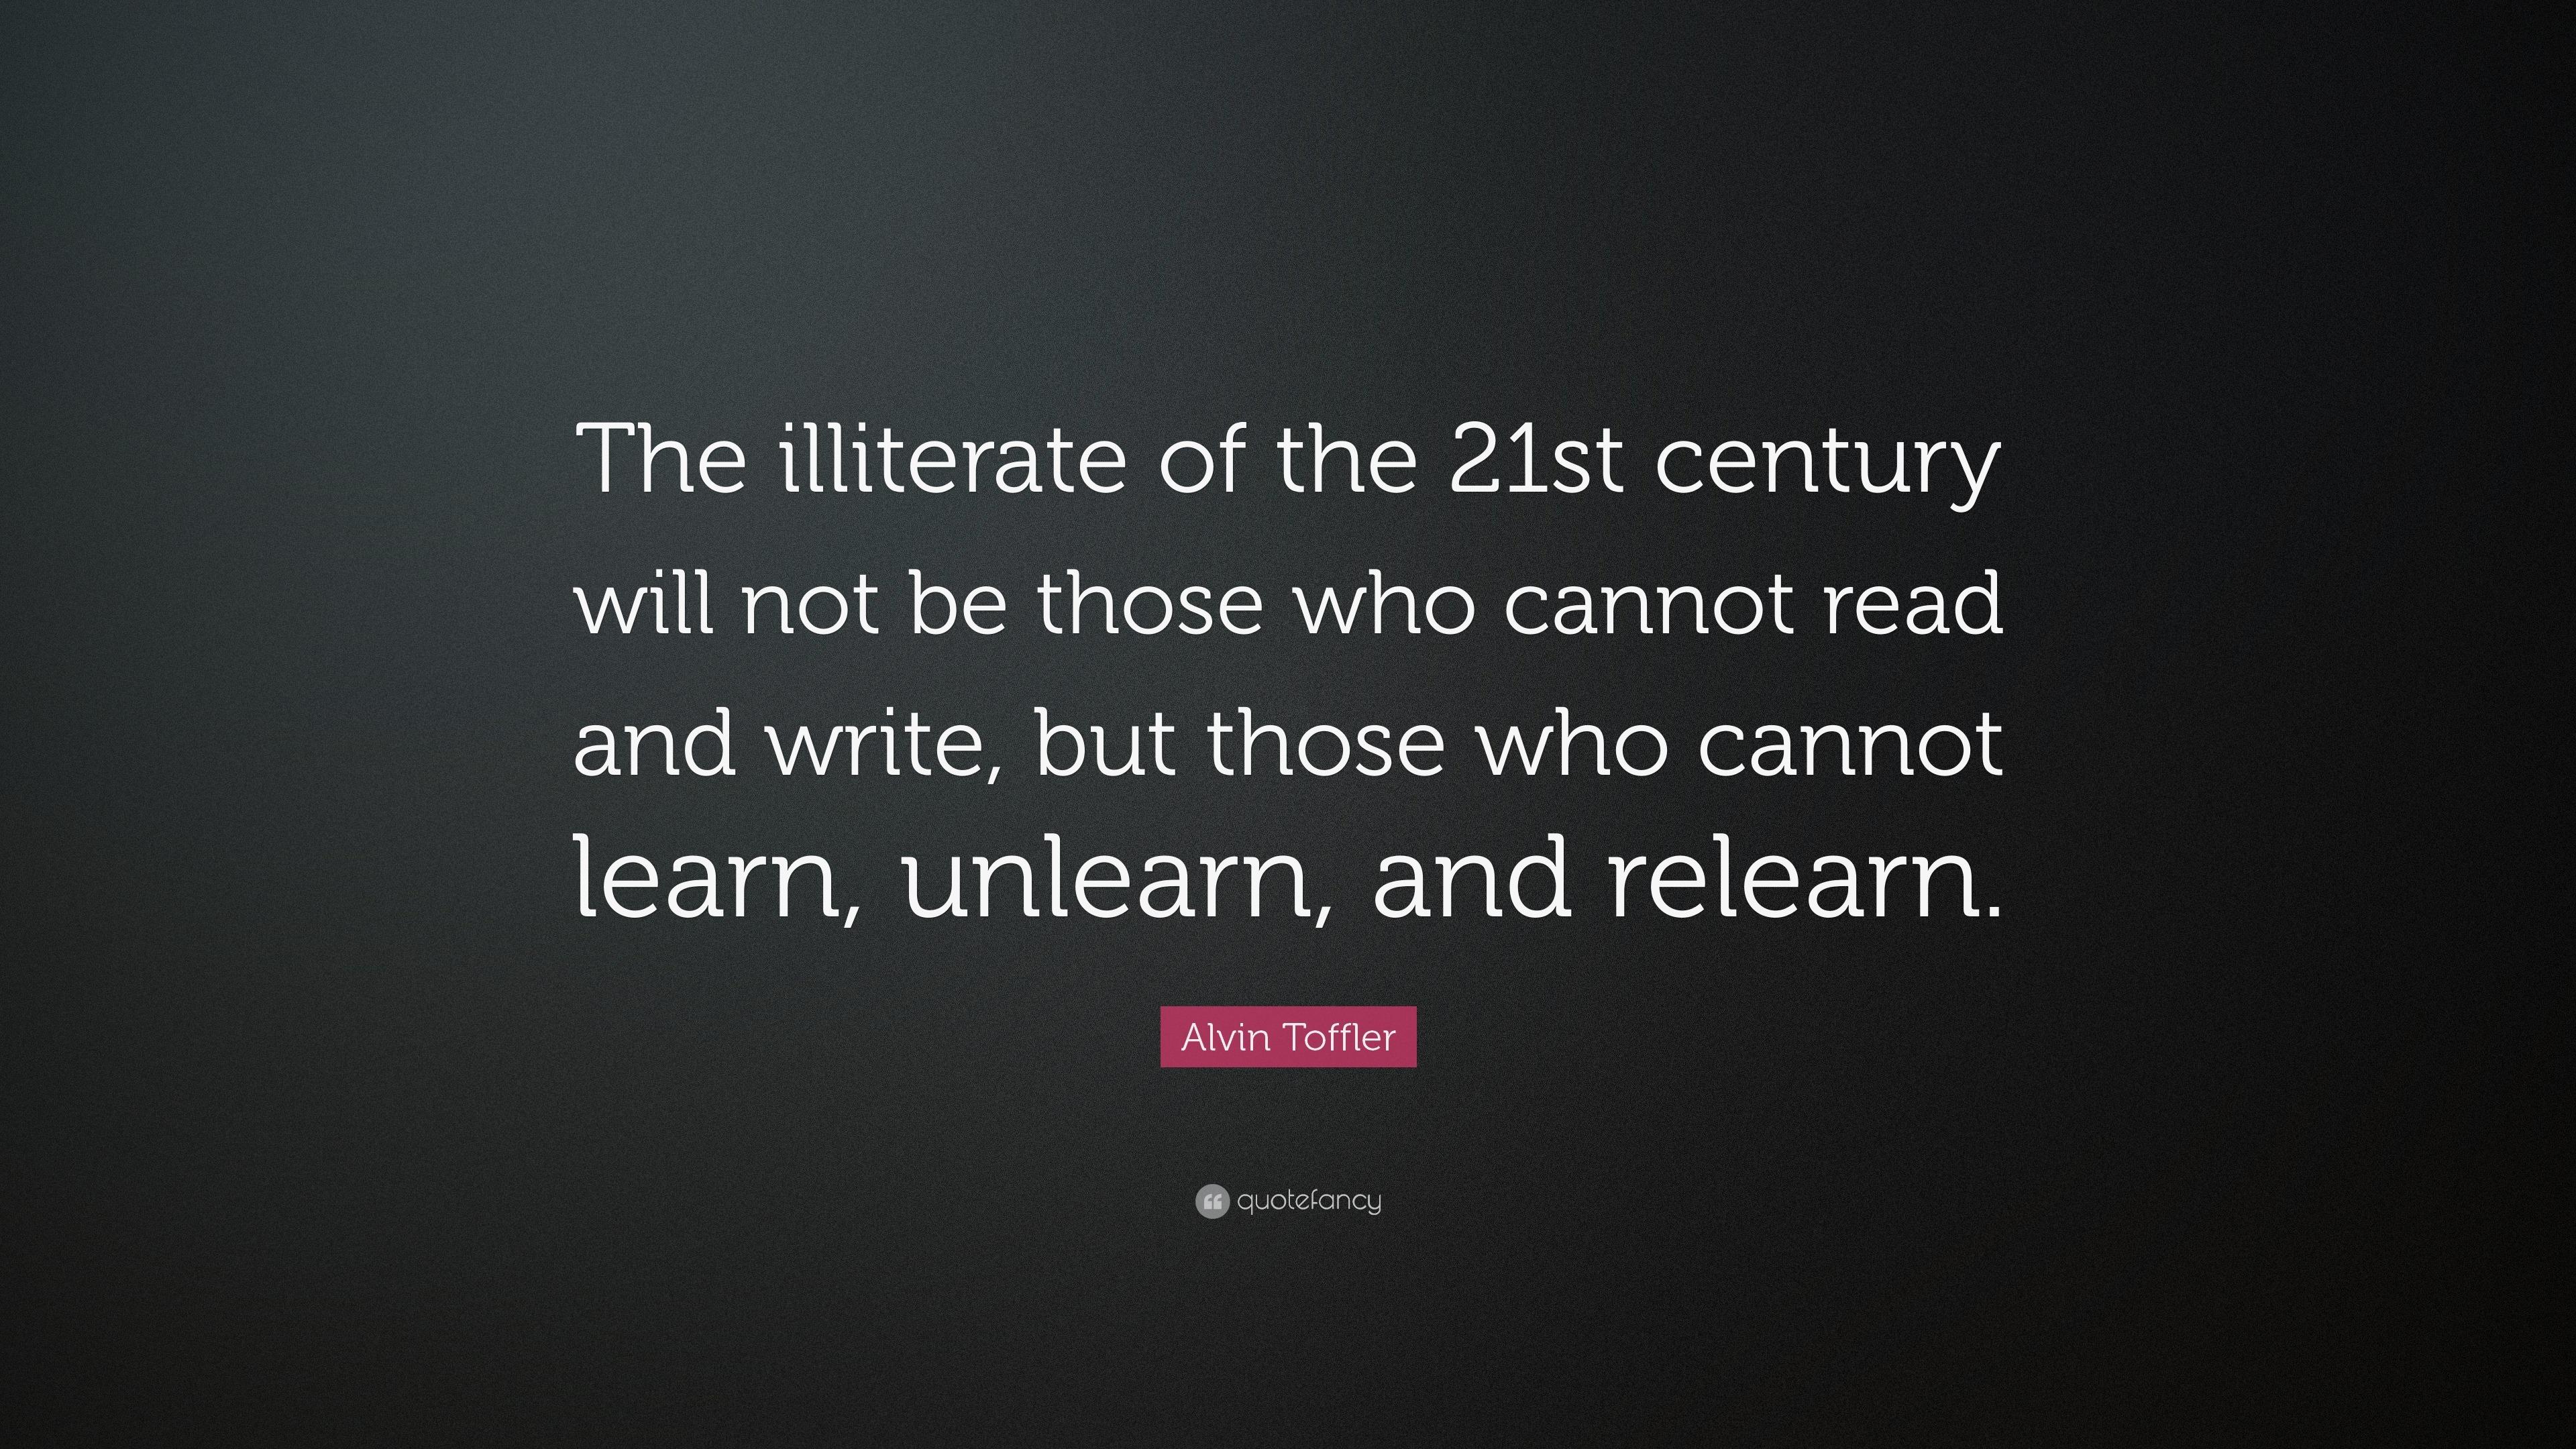 Obama Wallpaper Quote Alvin Toffler Quote The Illiterate Of The 21st Century